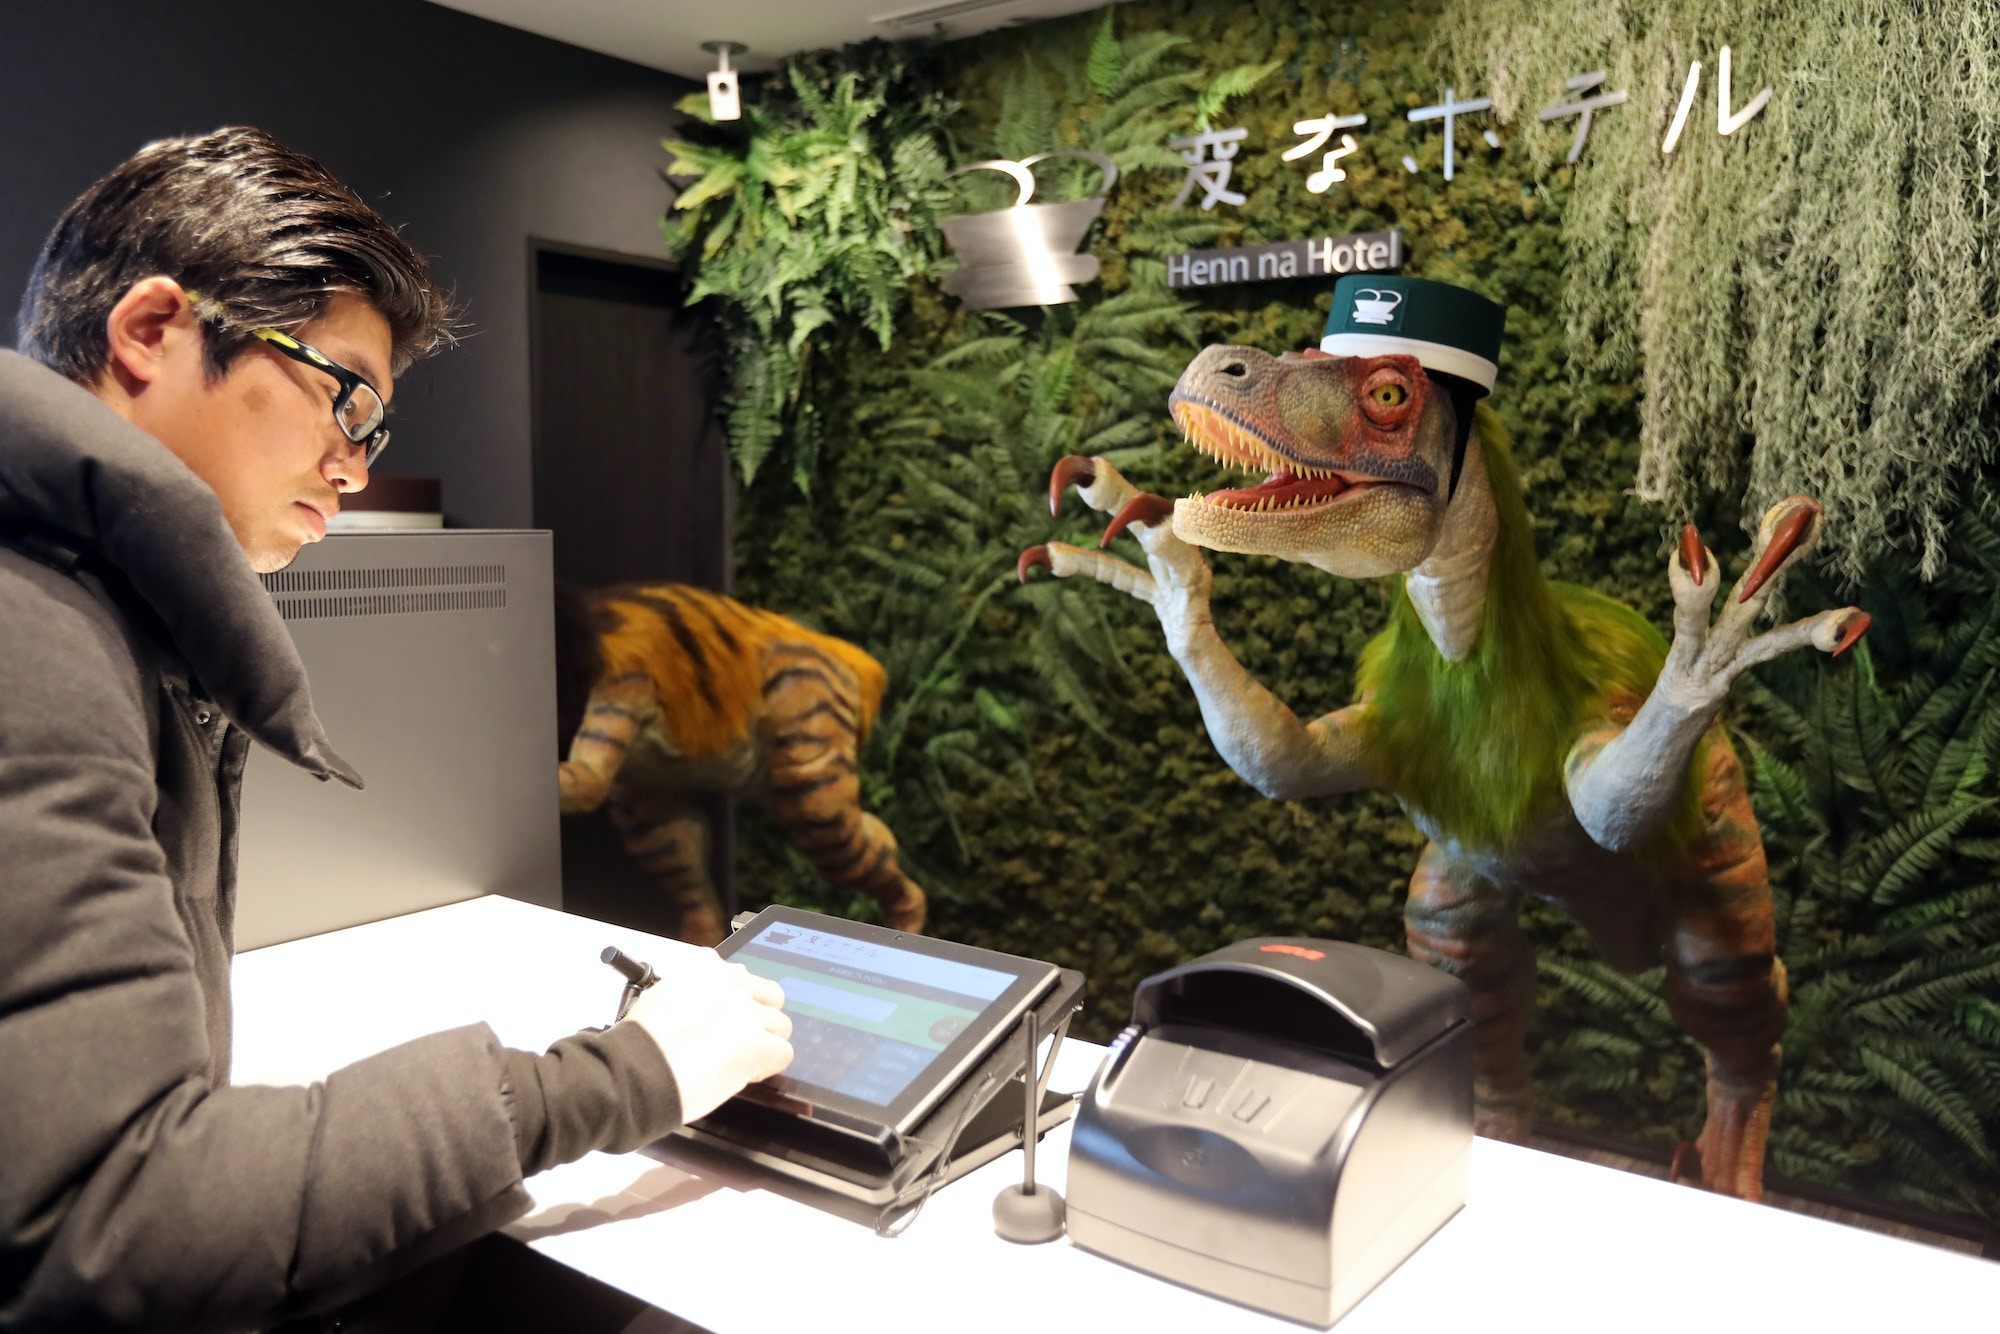 A dinosaur robot greets a guest at the Henn na Hotel, Japan